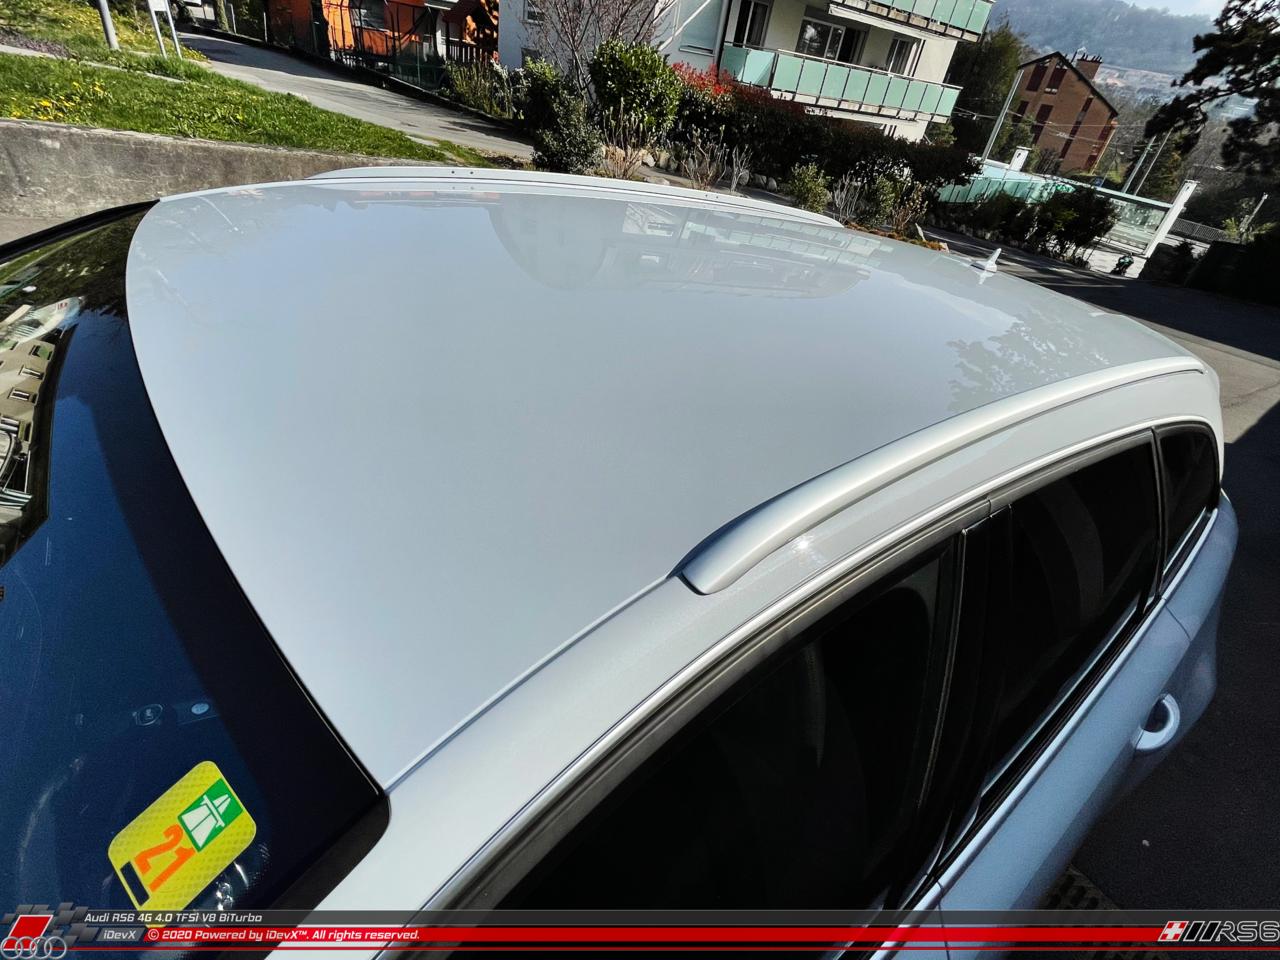 03.04.2021_Audi-RS6_iDevX_009.png